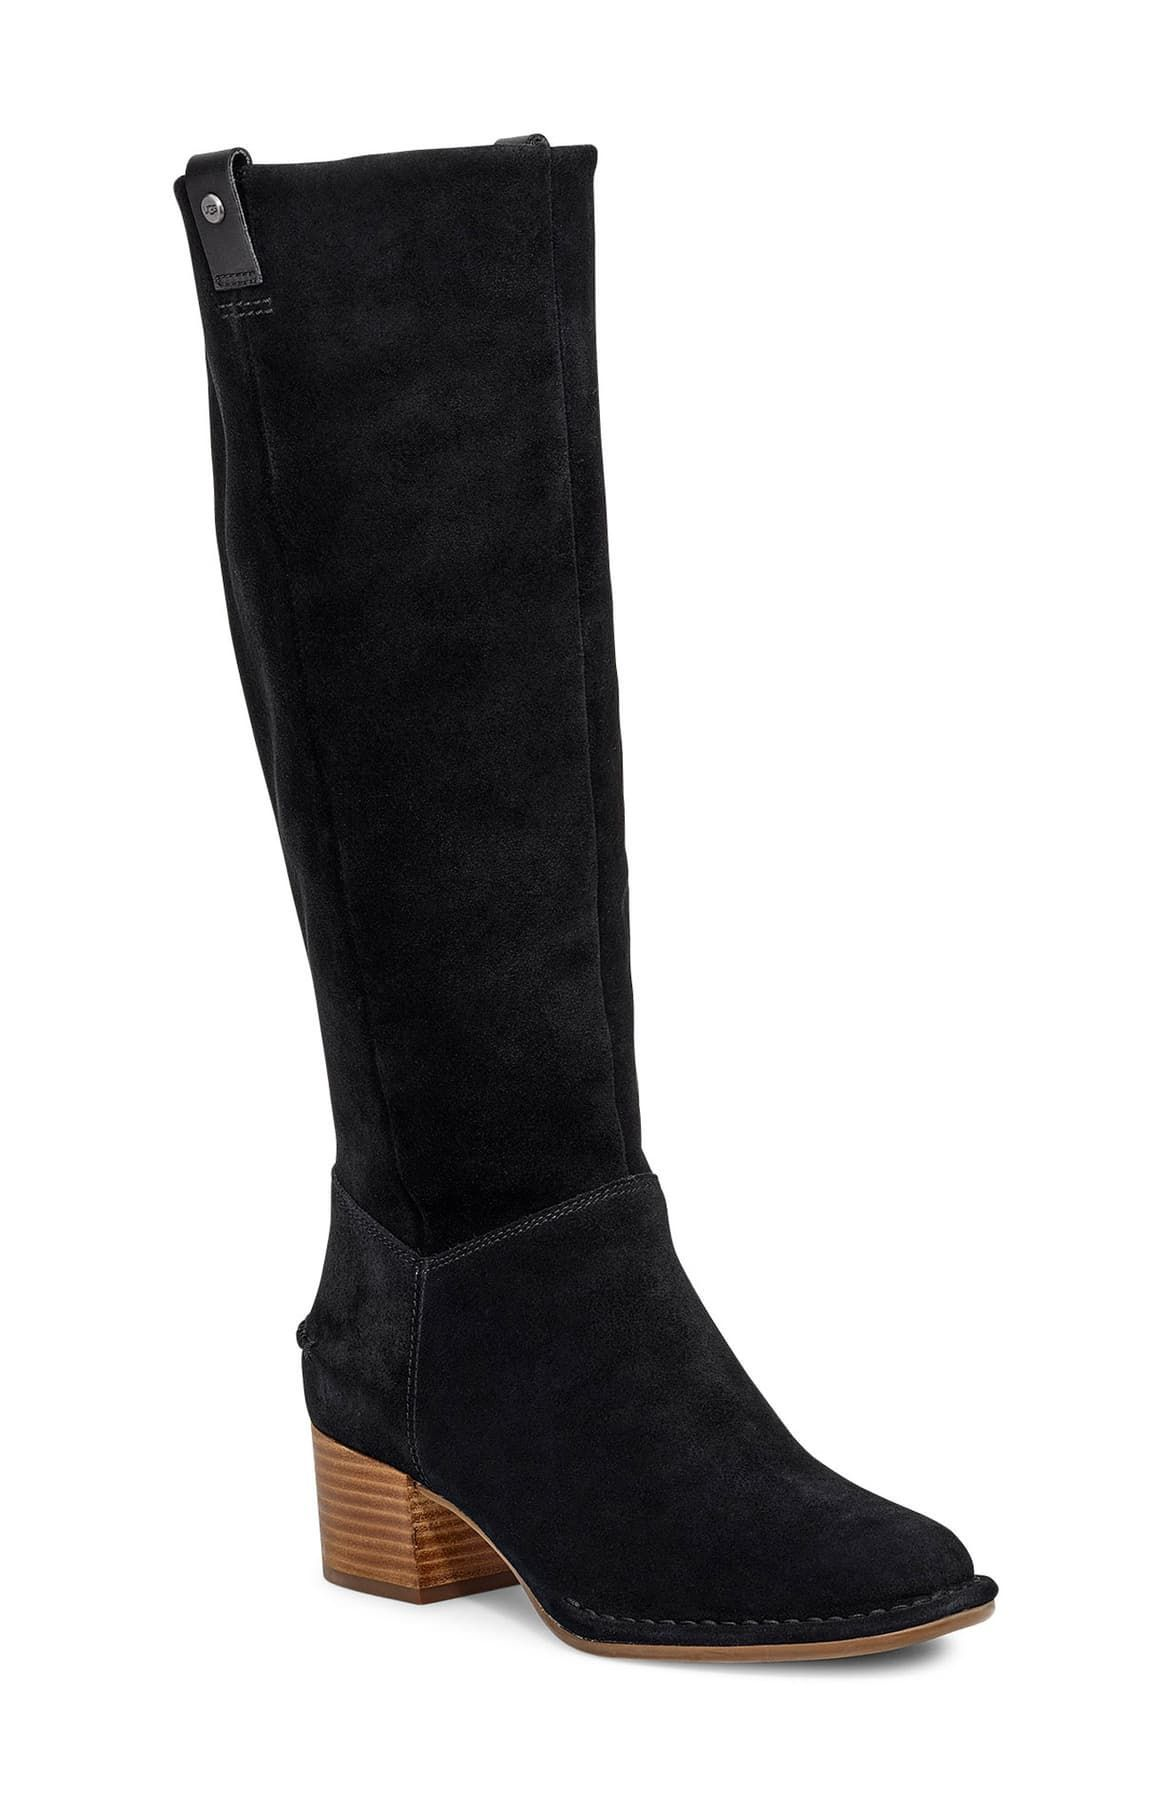 arana kne high leather boots